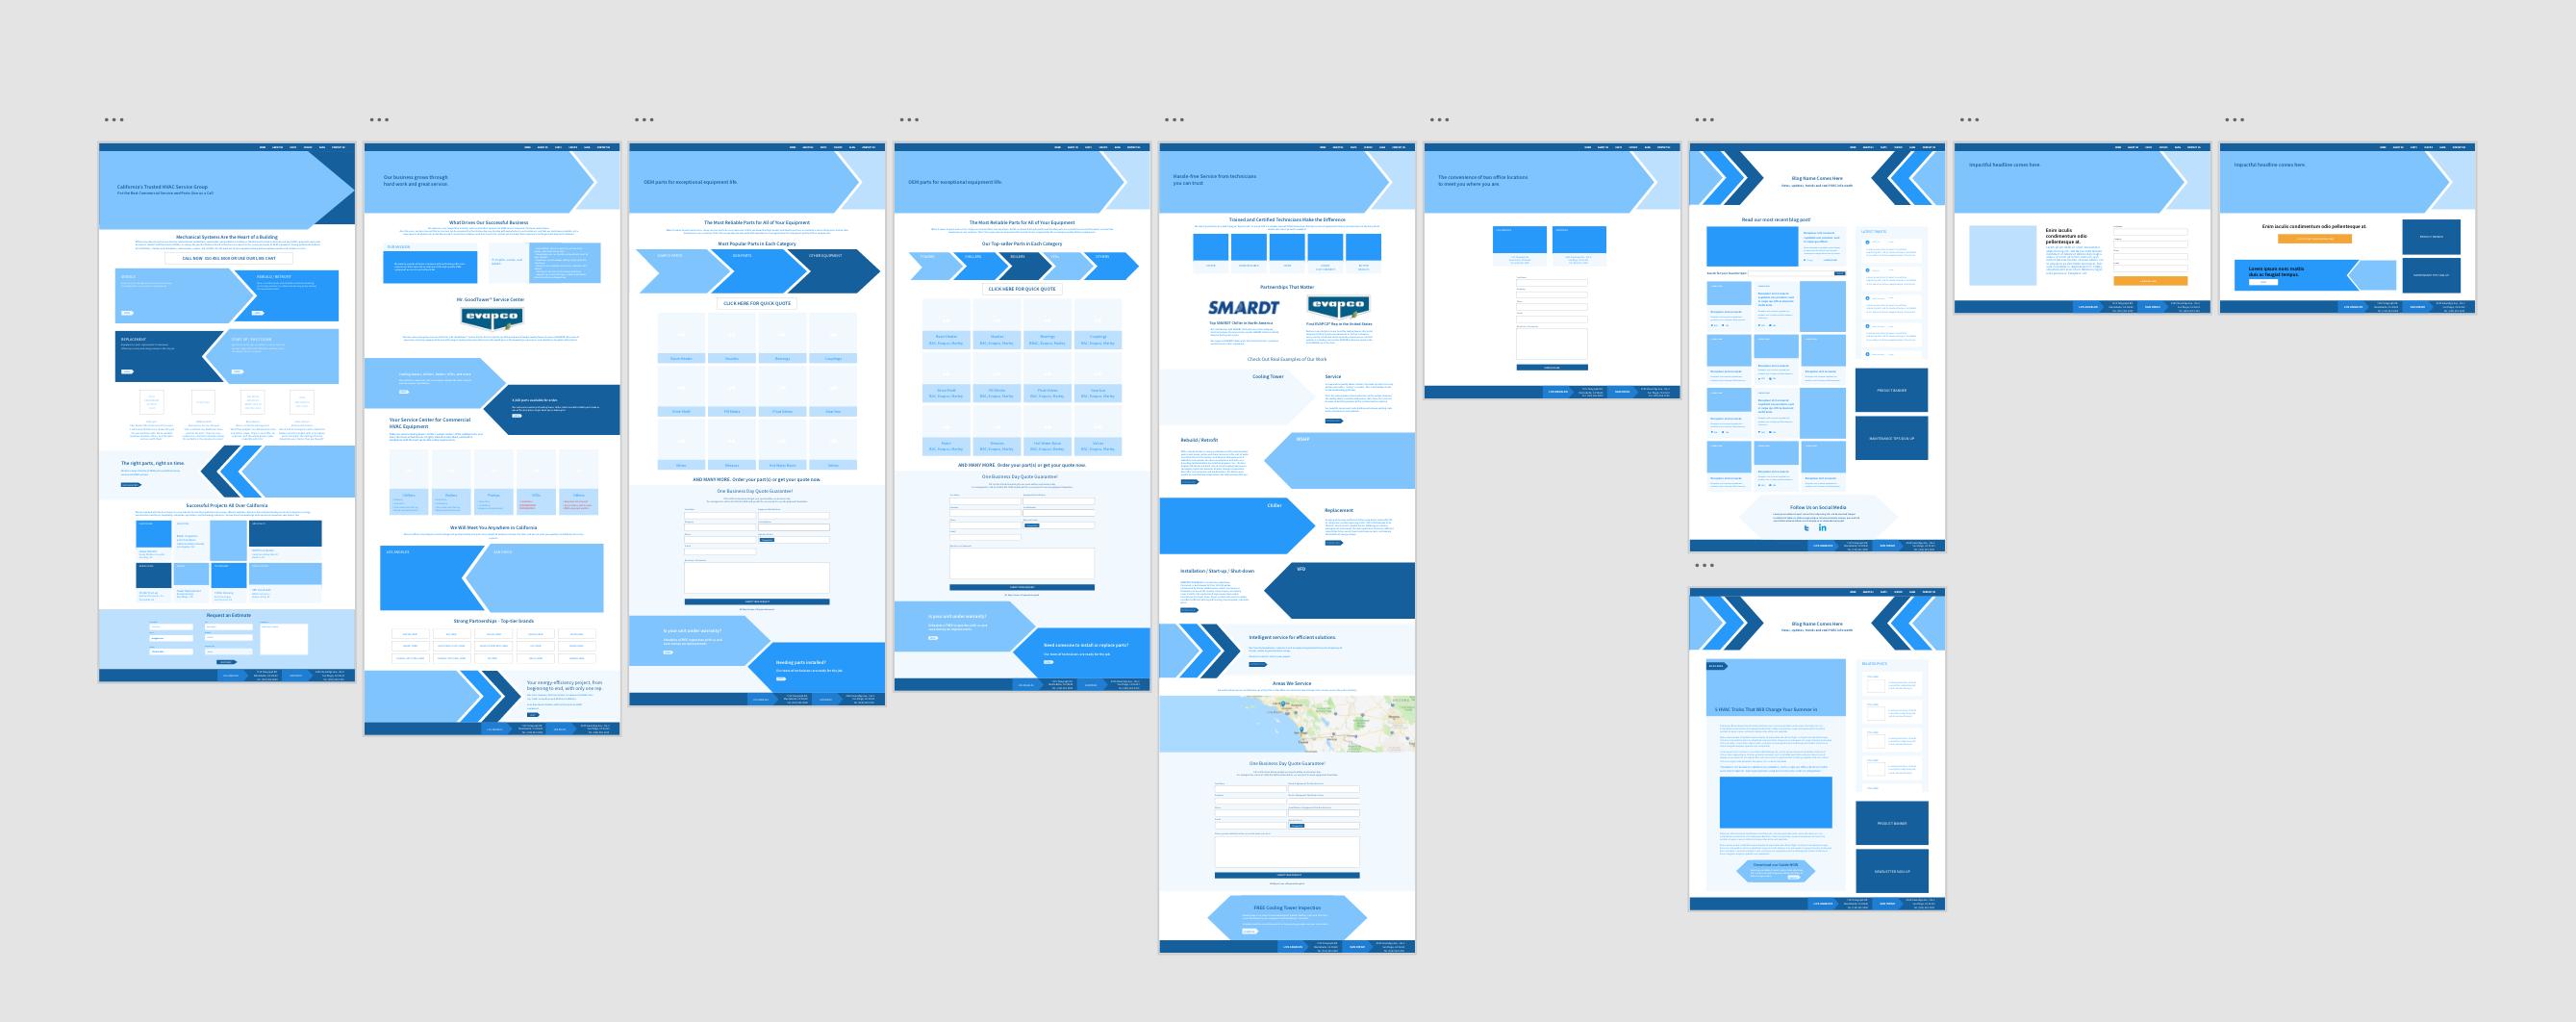 webdesign strategy - wireframes